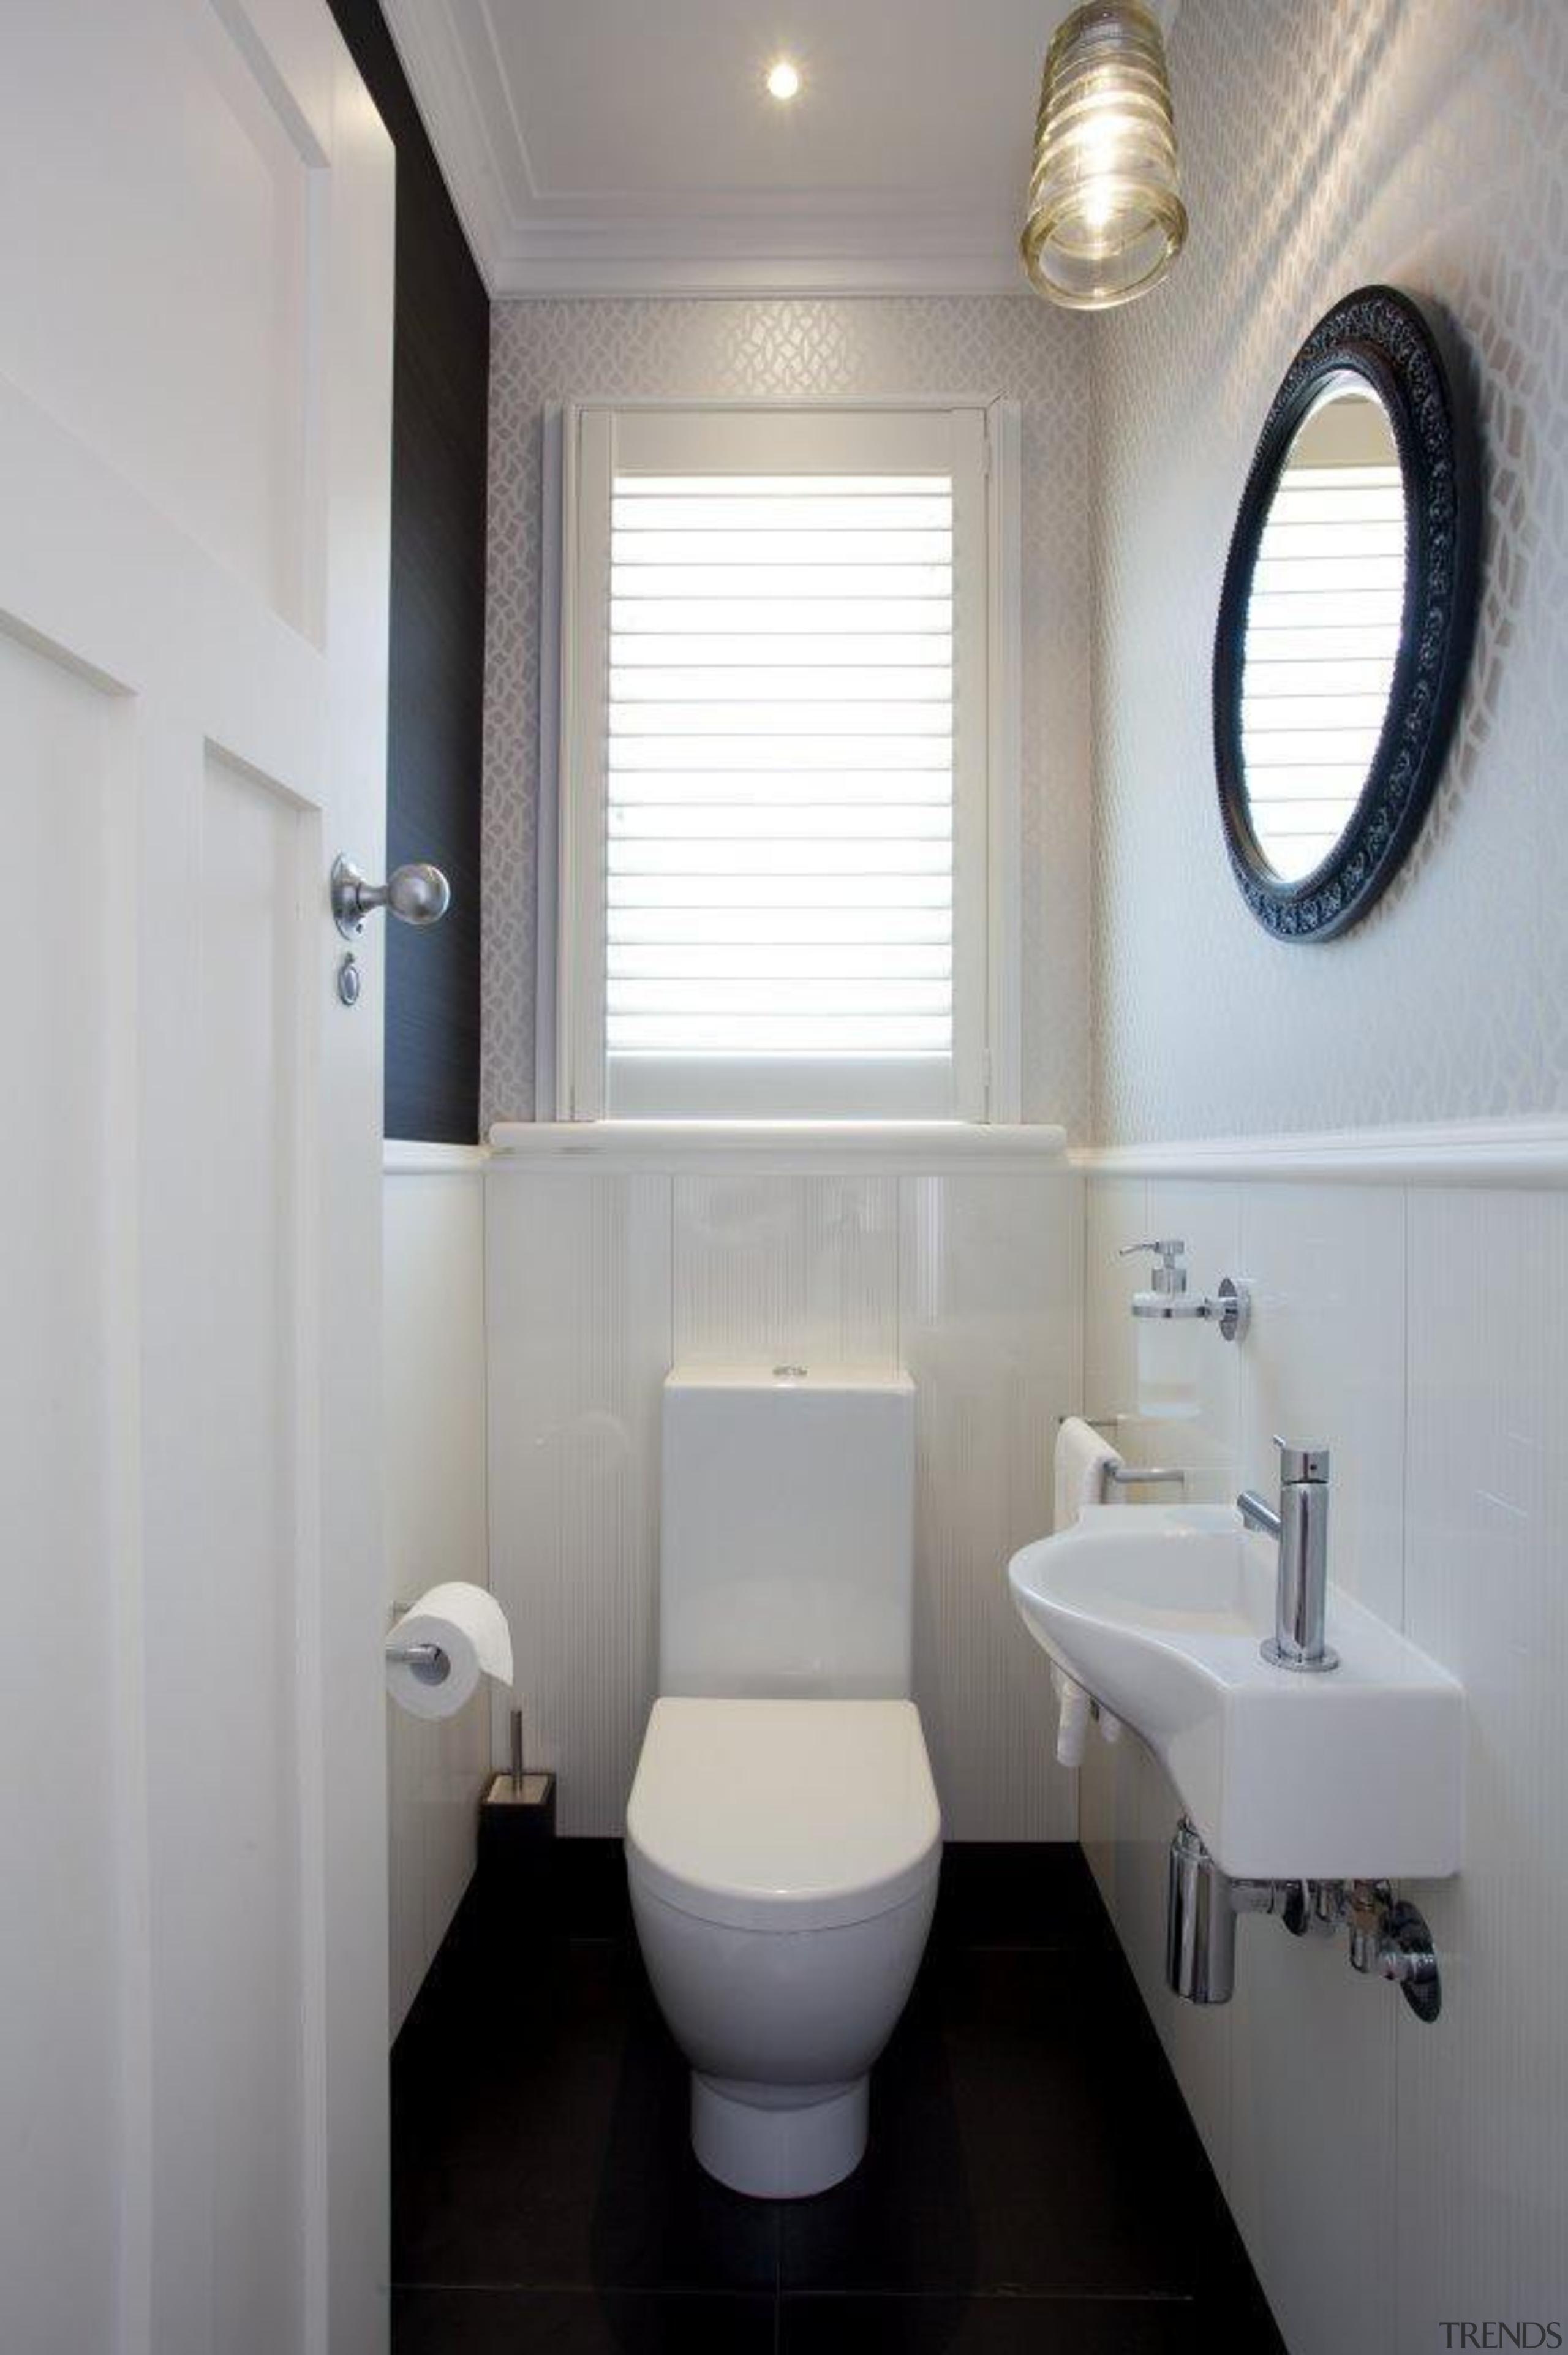 classical powder room.jpg - classical_powder_room.jpg - bathroom | bathroom, bidet, daylighting, home, interior design, plumbing fixture, product design, property, real estate, room, sink, toilet, toilet seat, window, gray